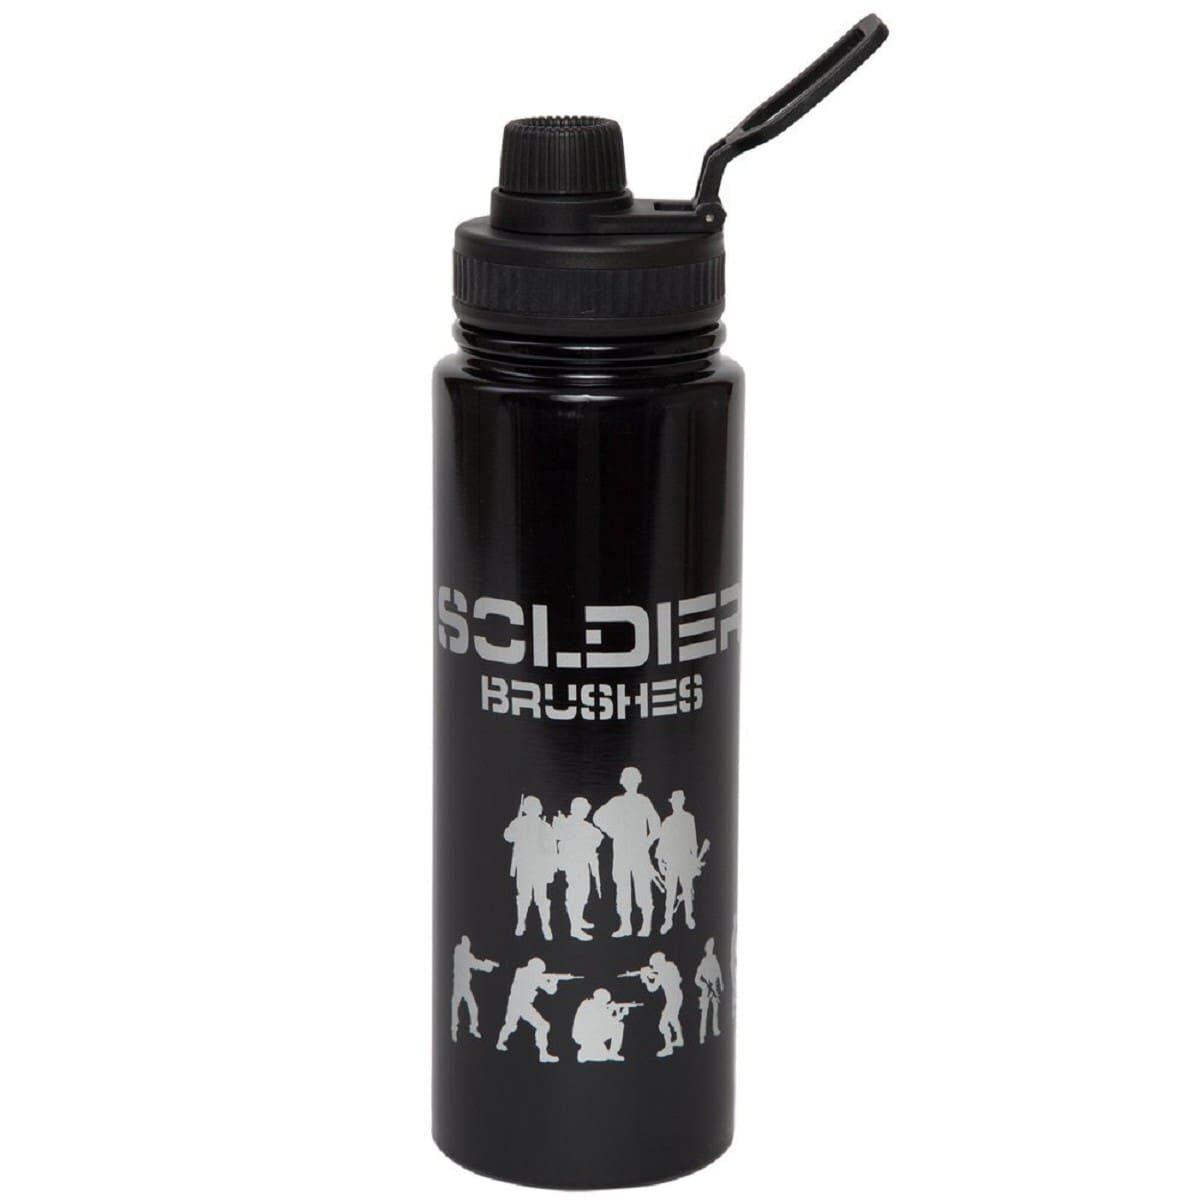 Металева пляшка для напоїв Солдати 800 мл, чорна